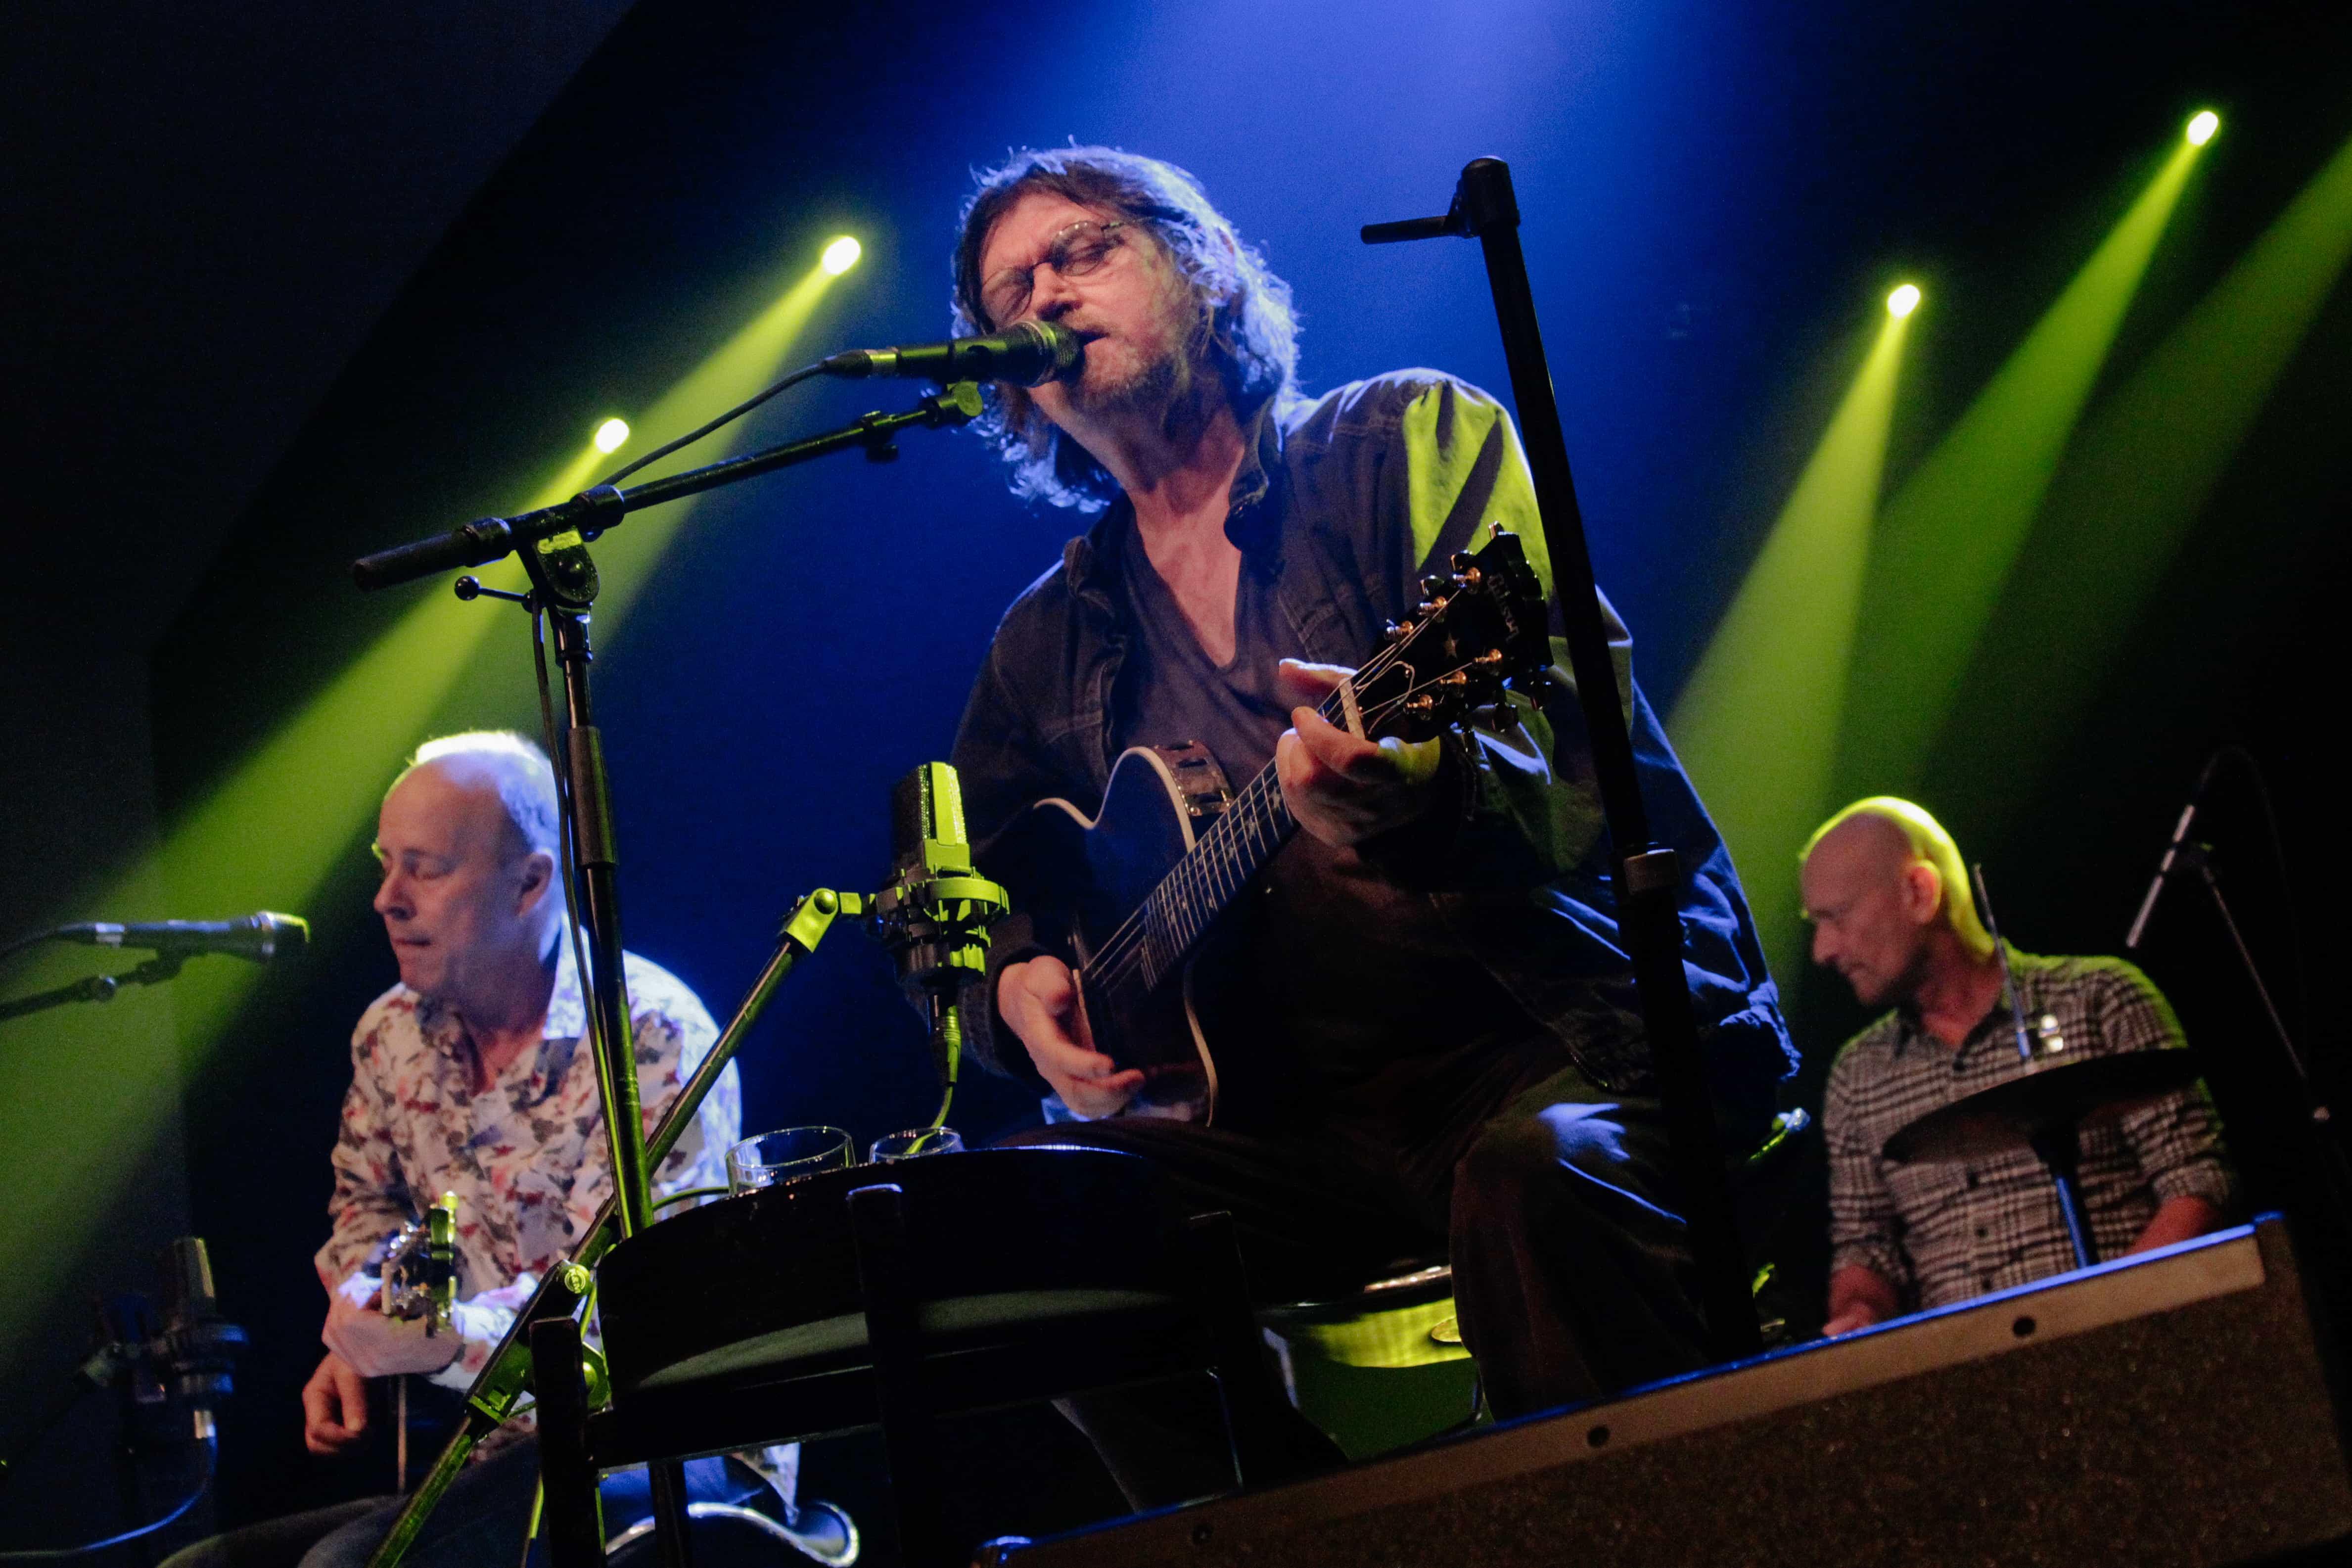 Koncert med Johnny Madsen i Kulturcenter Vendsyssel